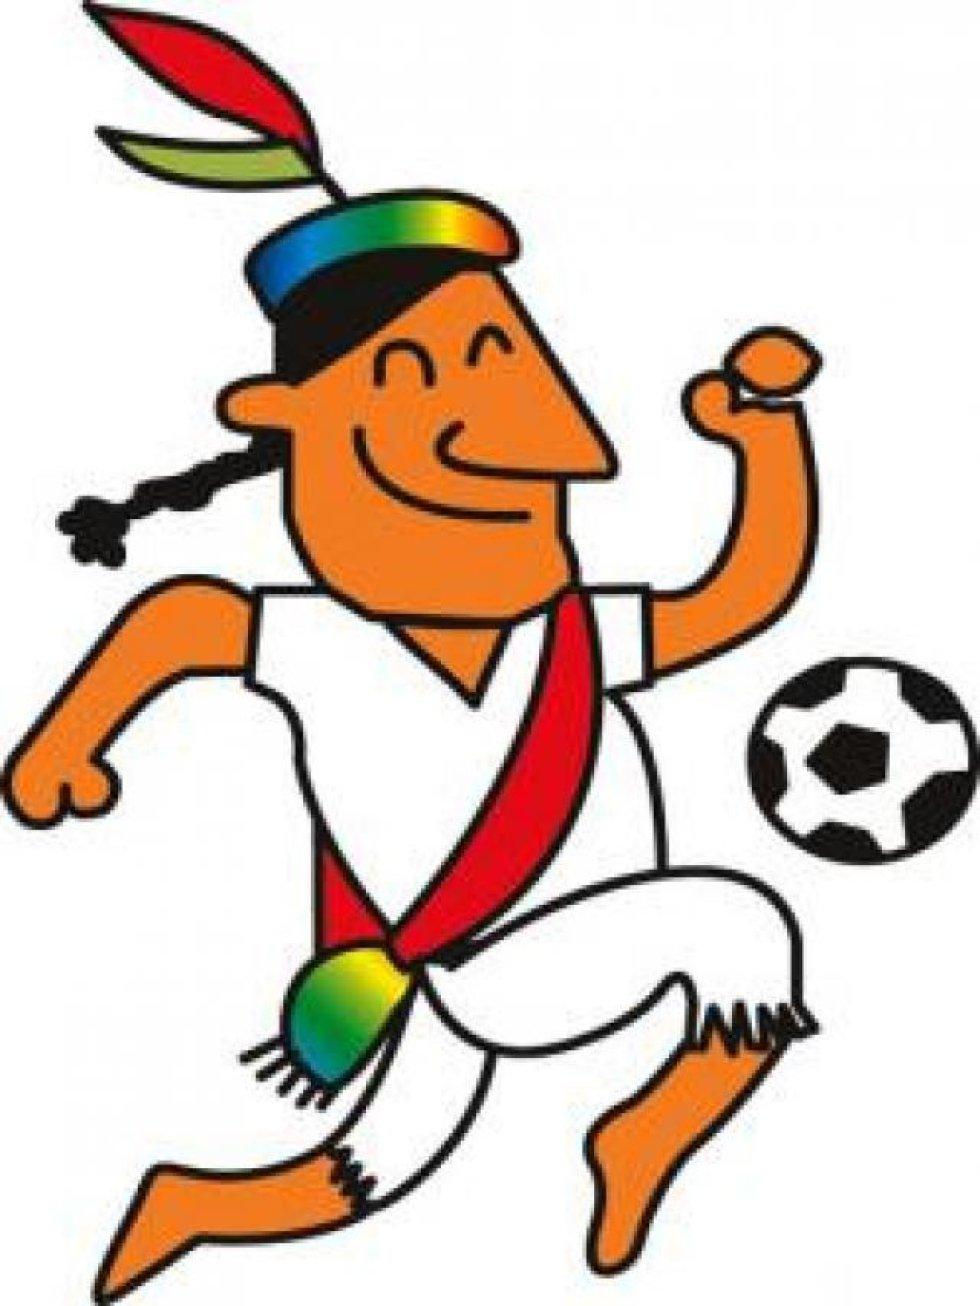 Mascota de la Copa América Perú 2004. Era un dibujo animando representando al Chasqui, mensajero personal del Inca.